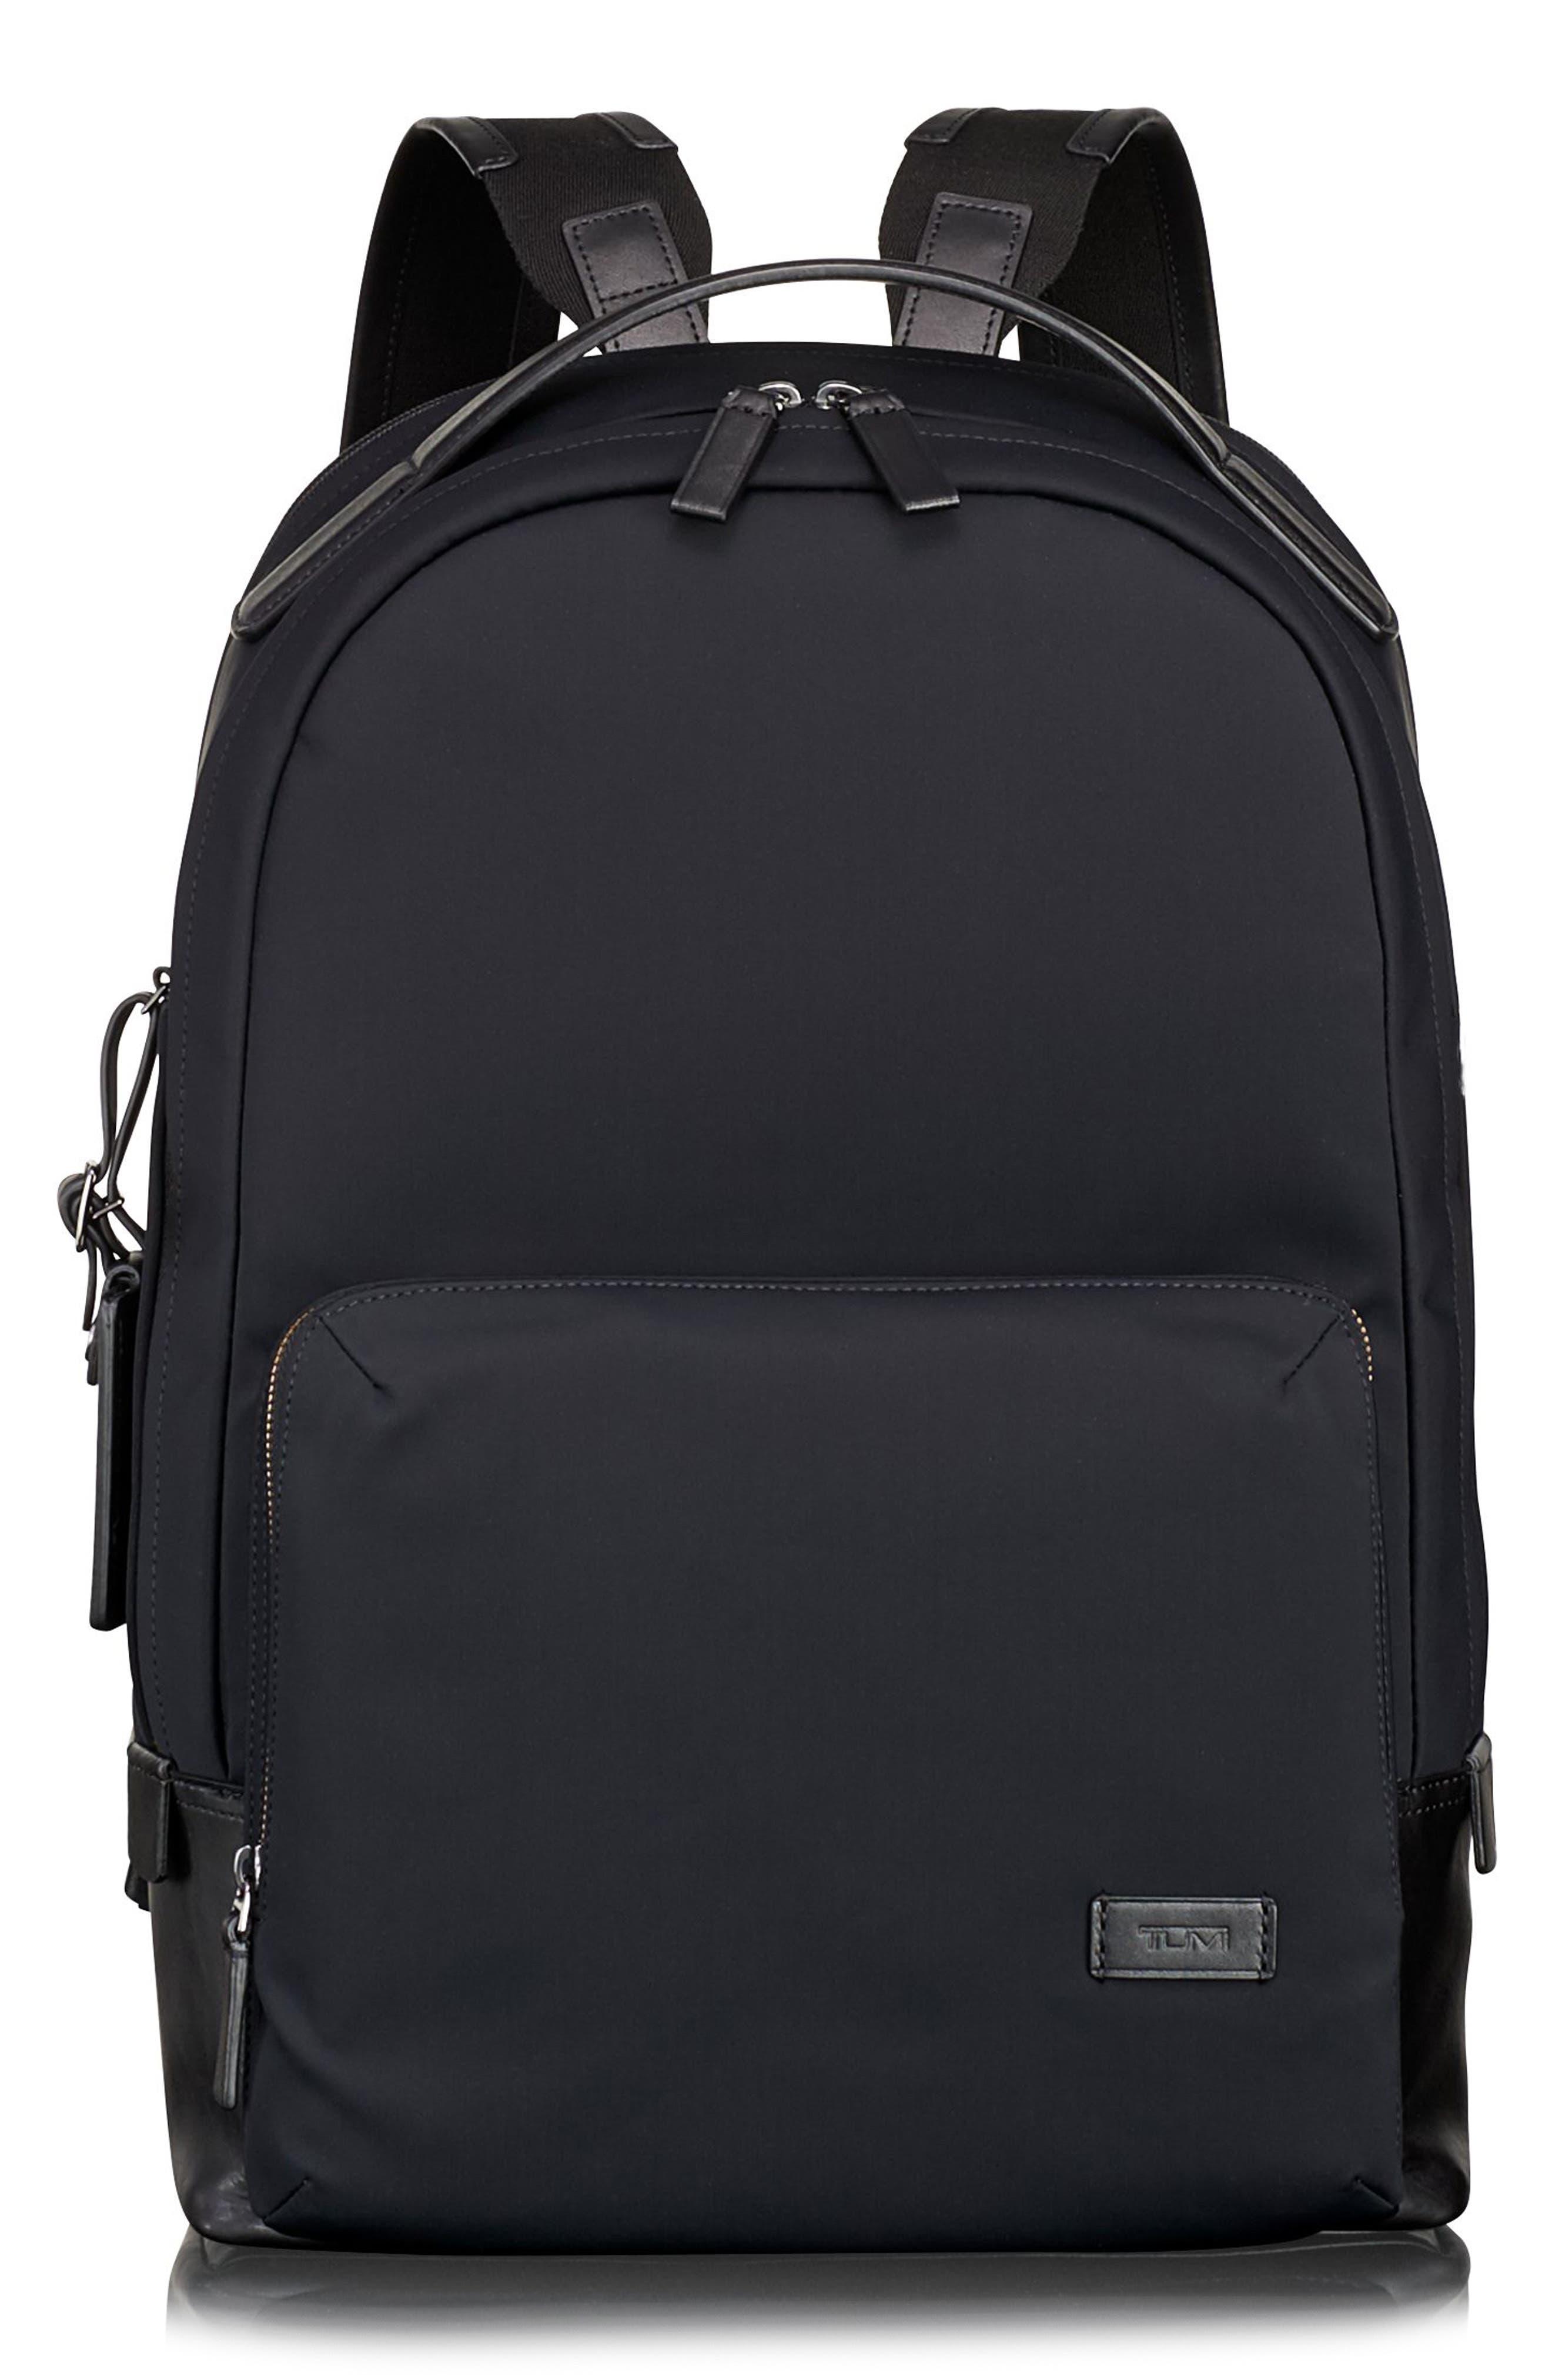 Harrison Webster Backpack,                             Main thumbnail 1, color,                             BLACK NYLON